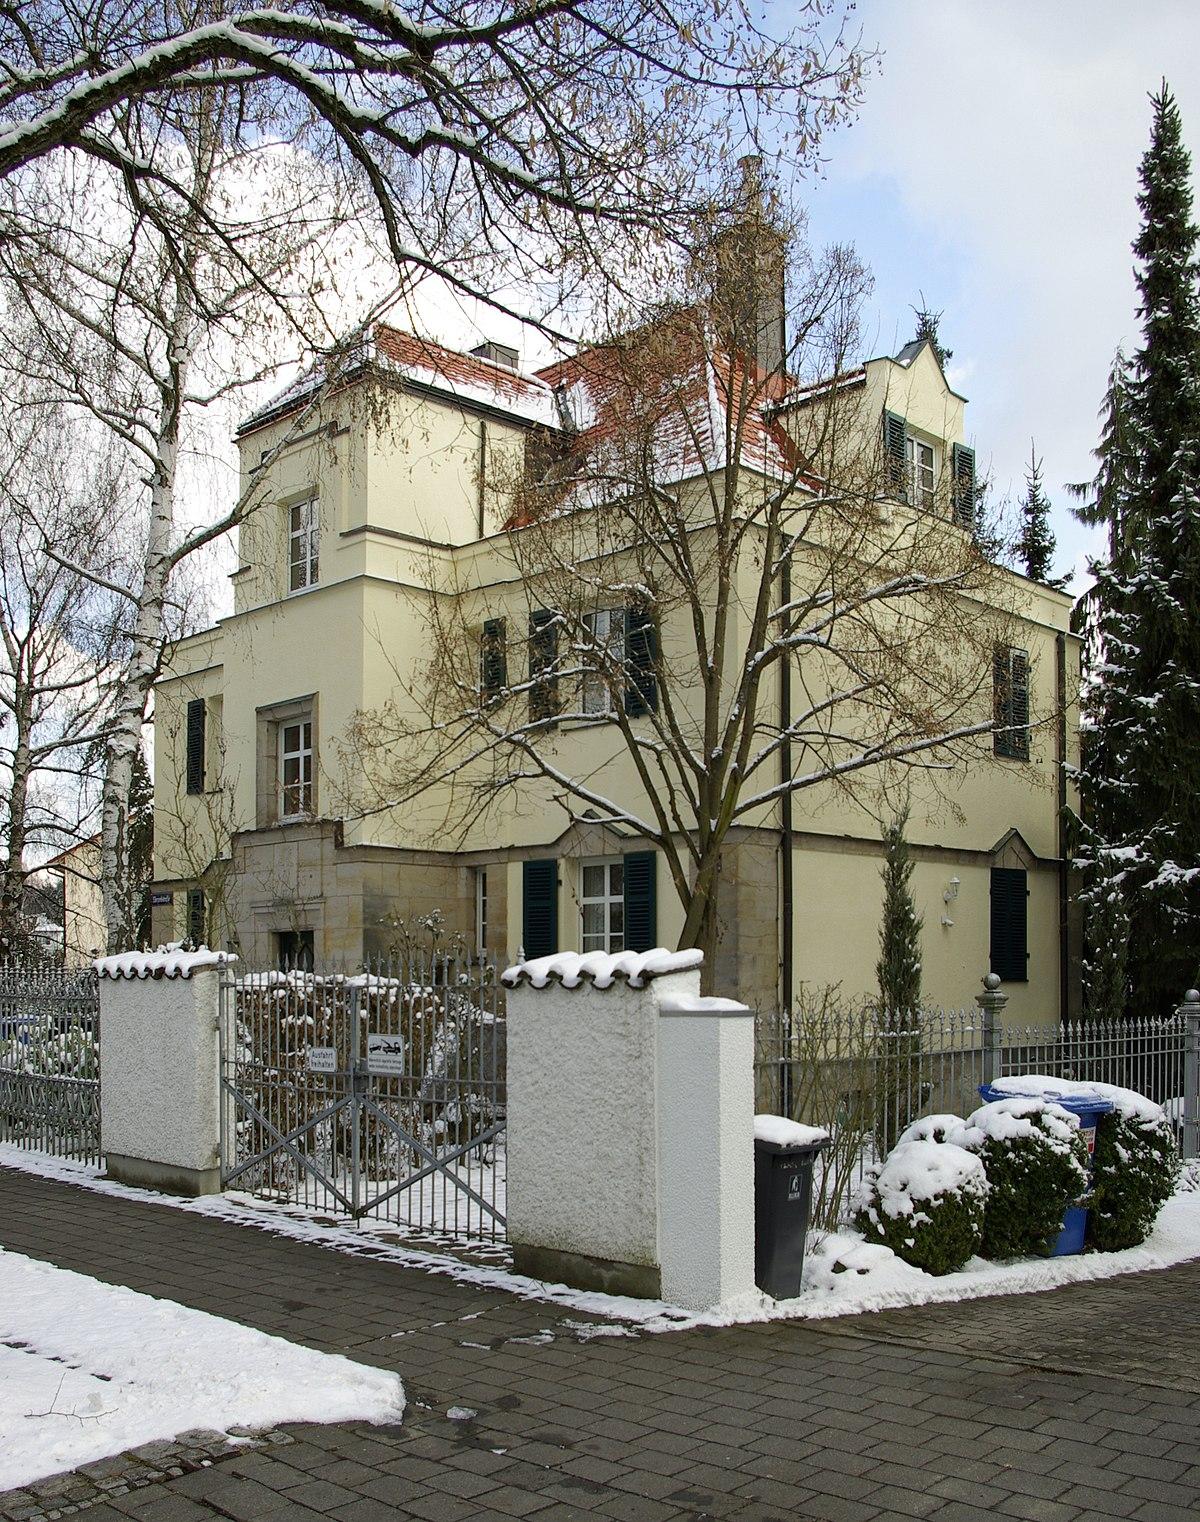 Ebrardstraße Erlangen